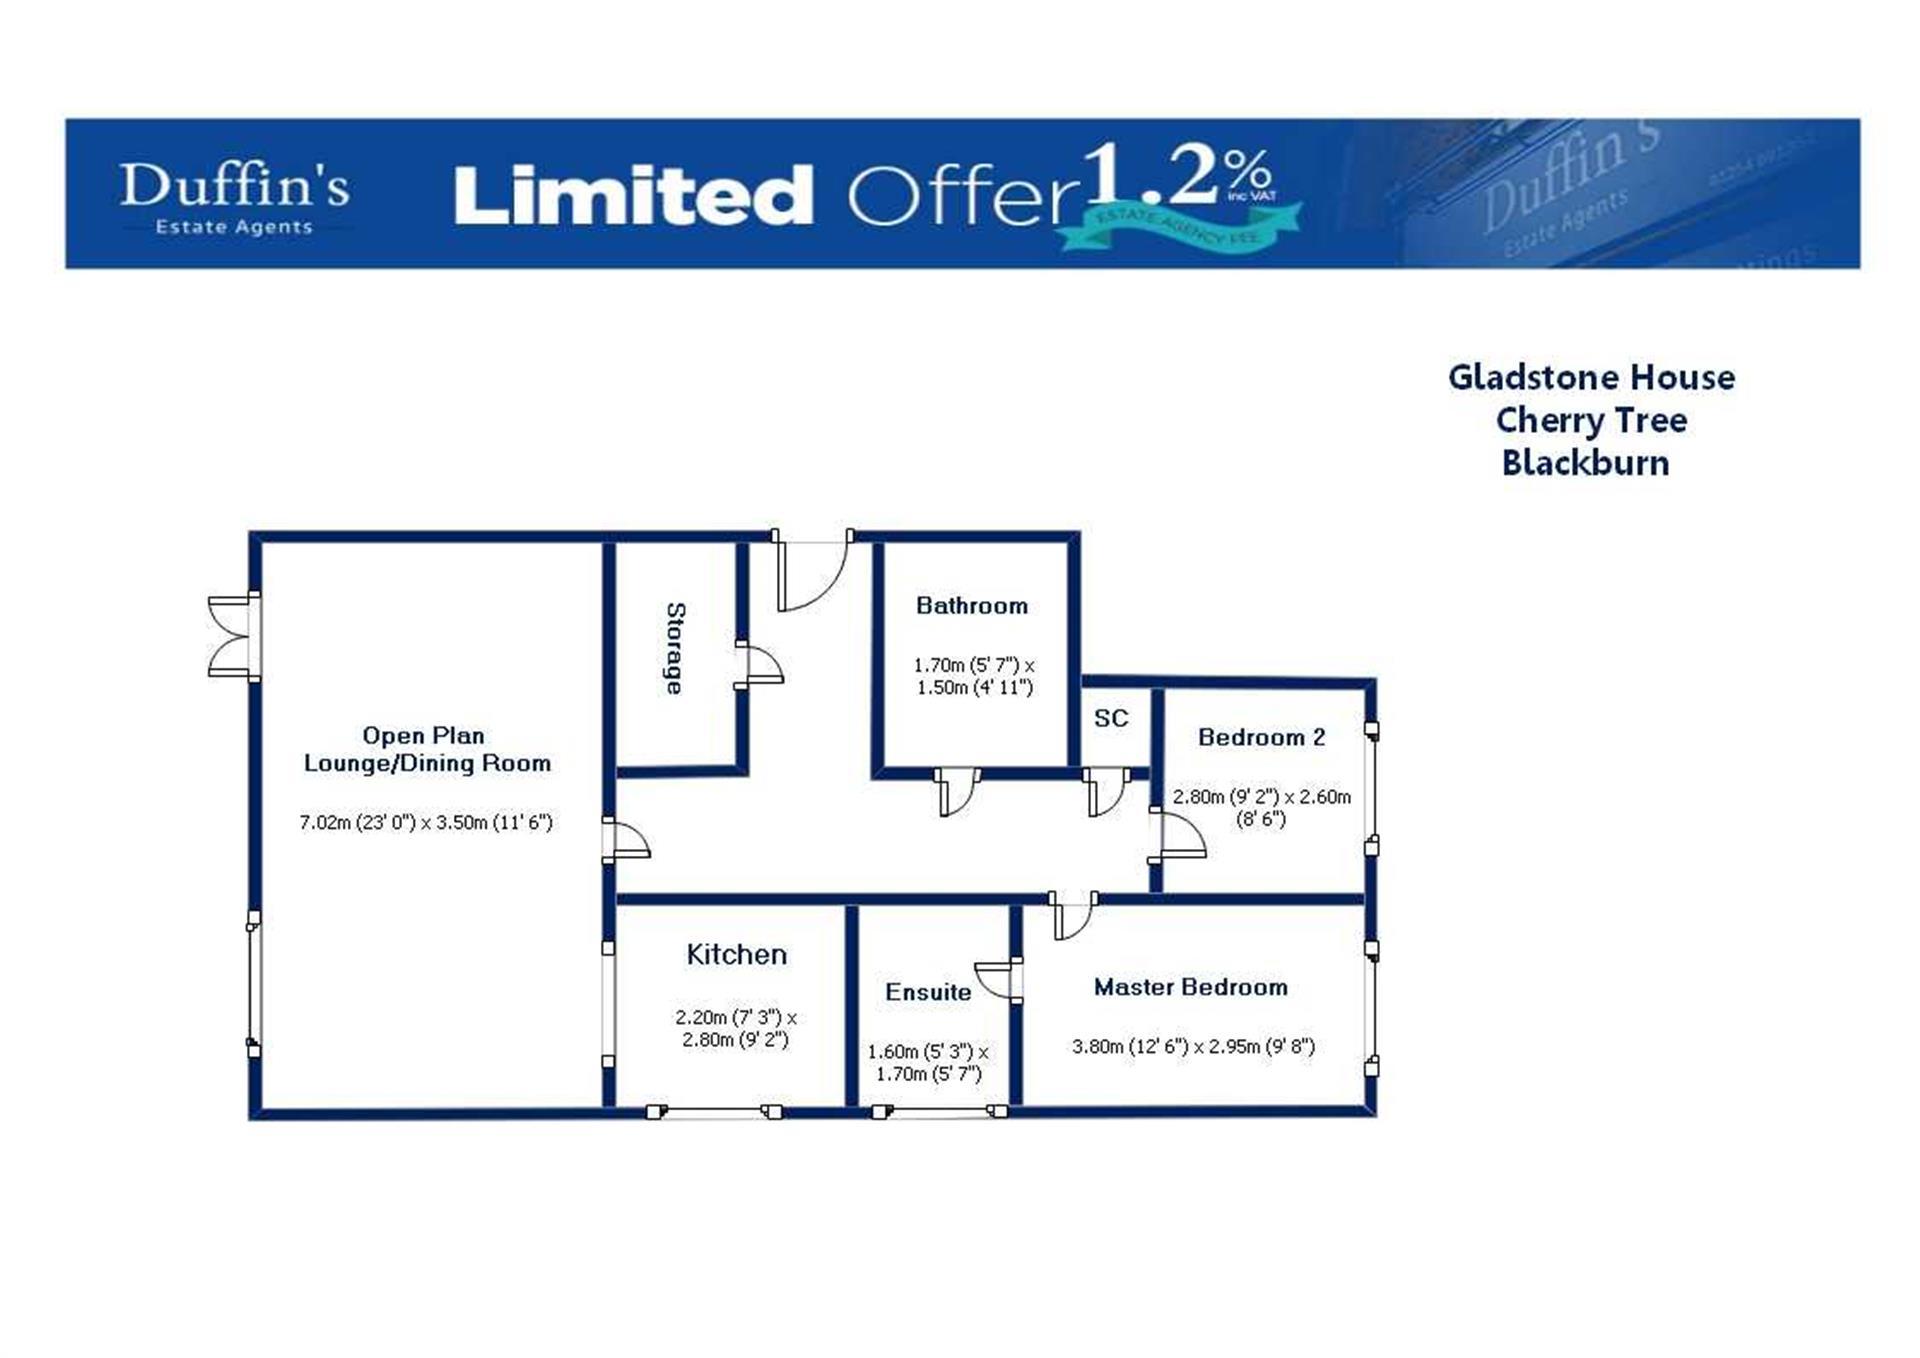 2 Bedroom Apartment Flat / Apartment For Sale - Floor Plans